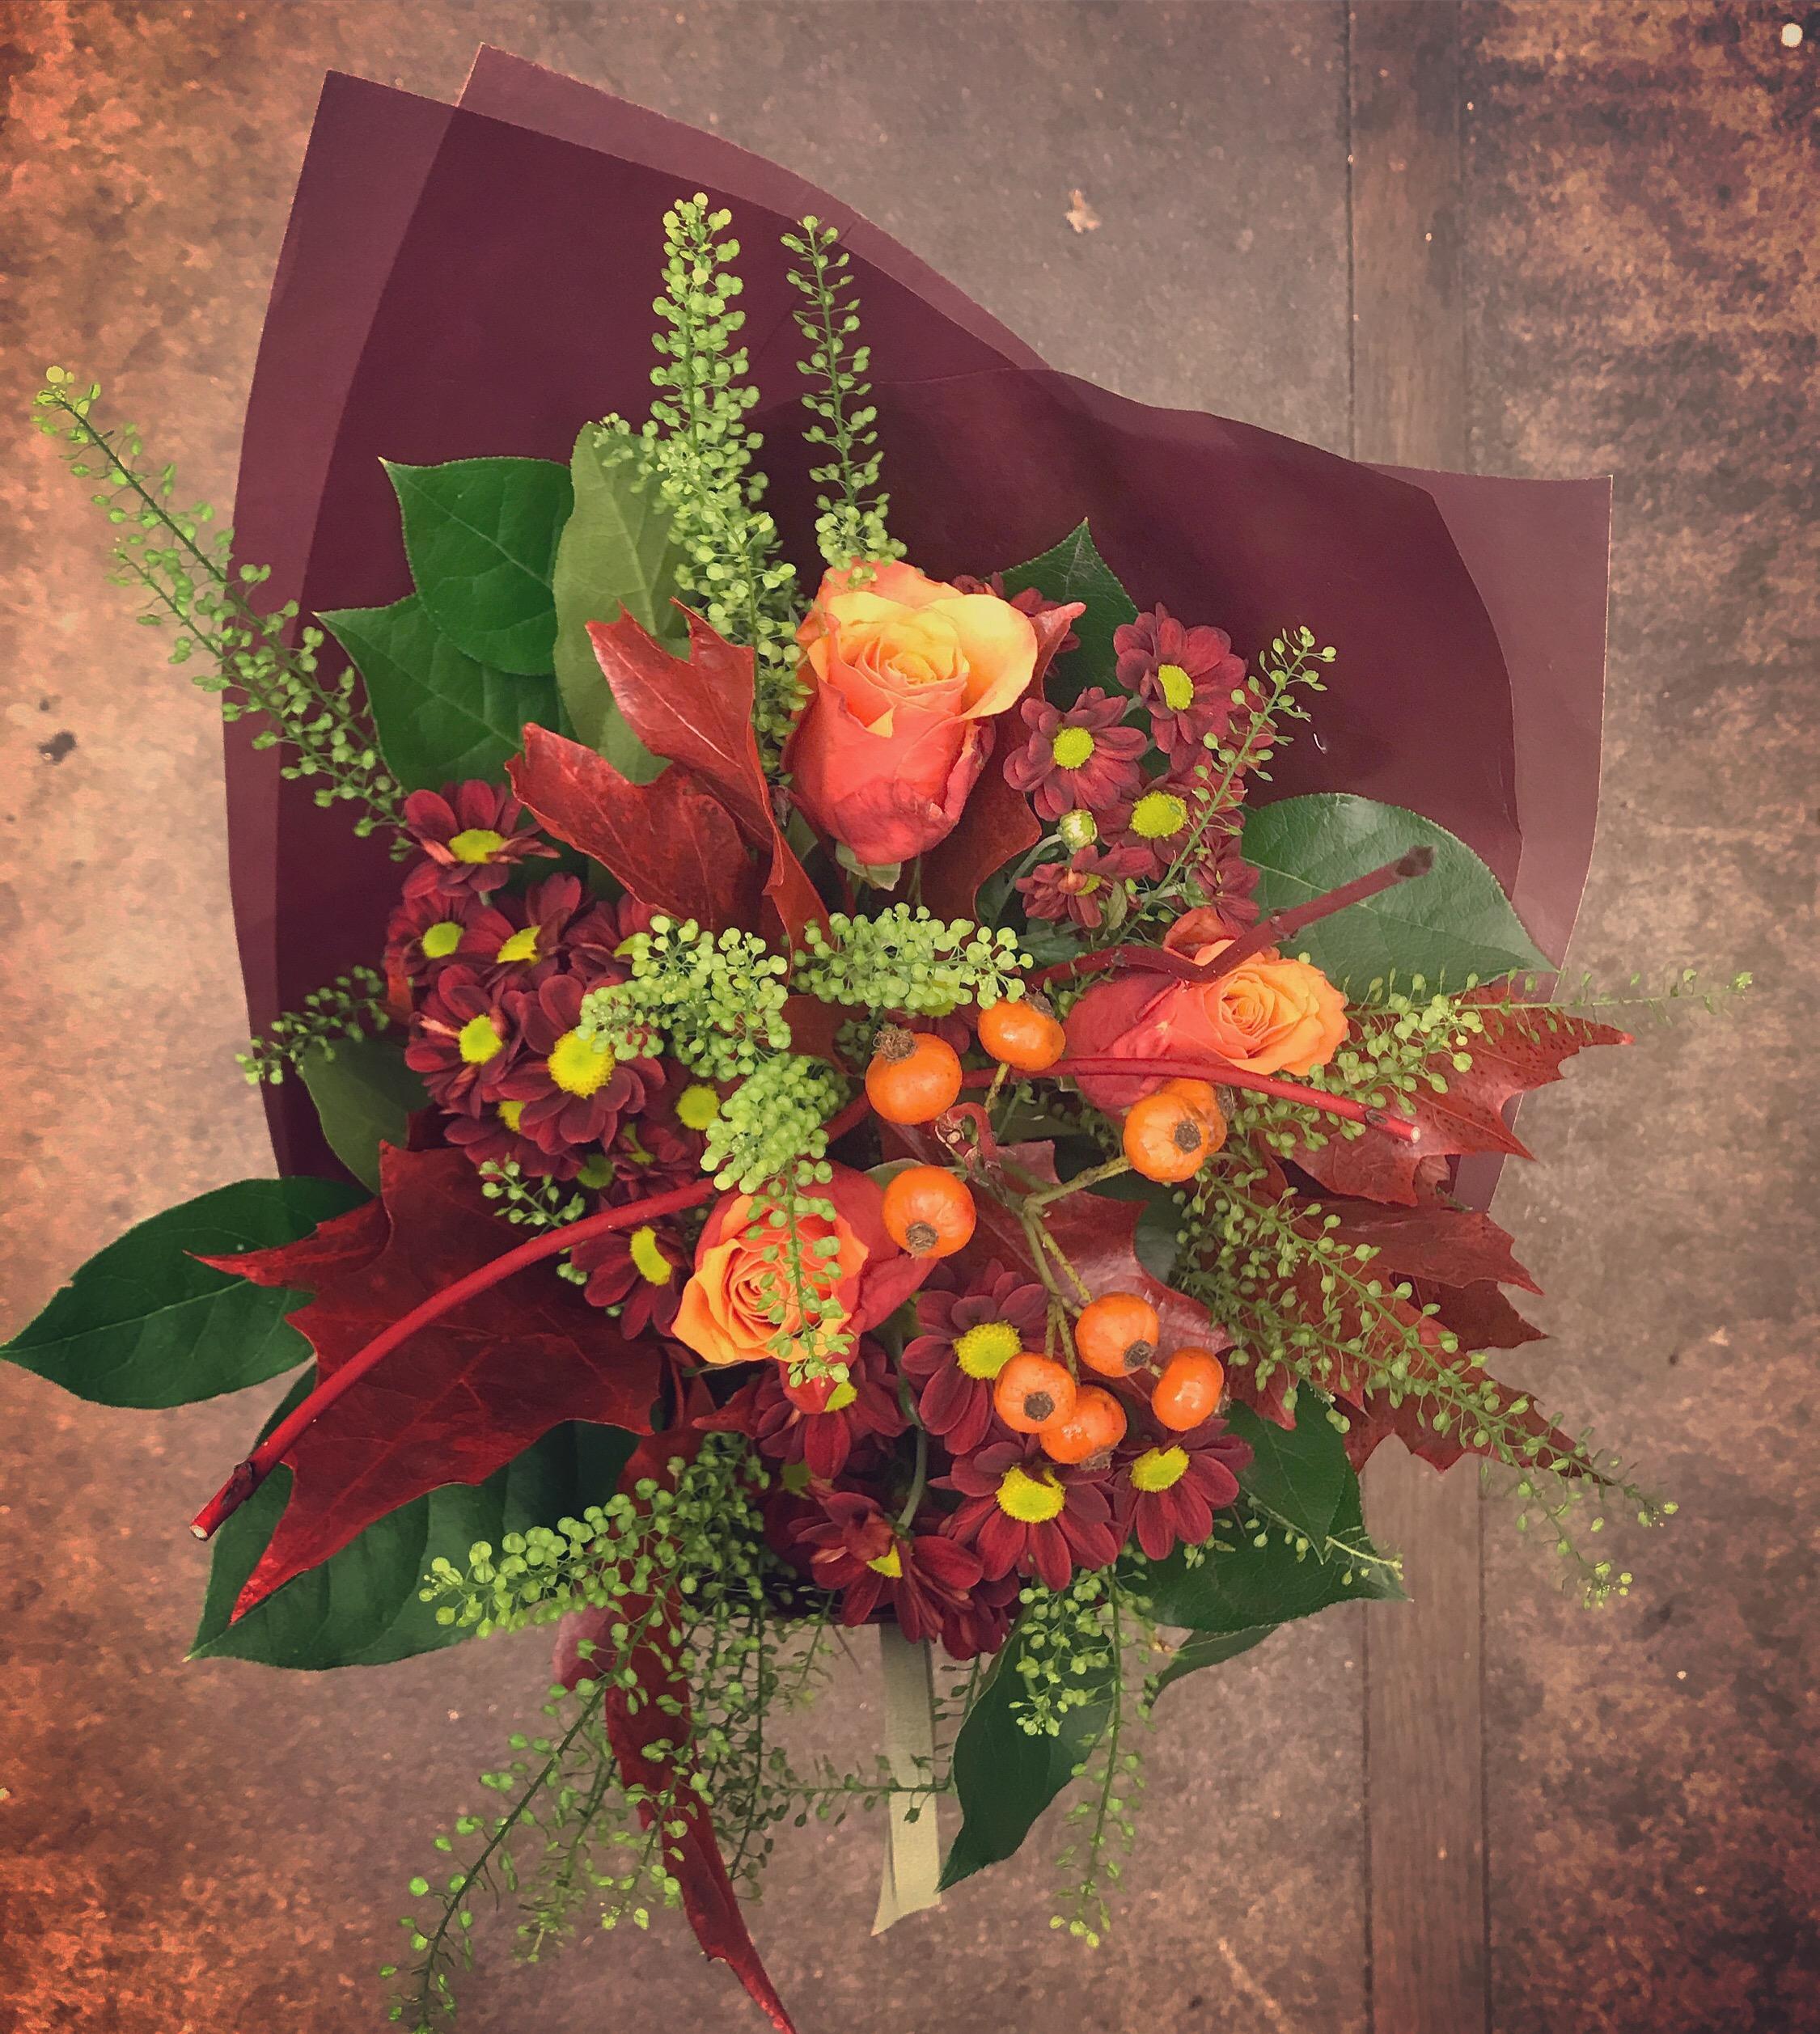 ljungs blommor göteborg